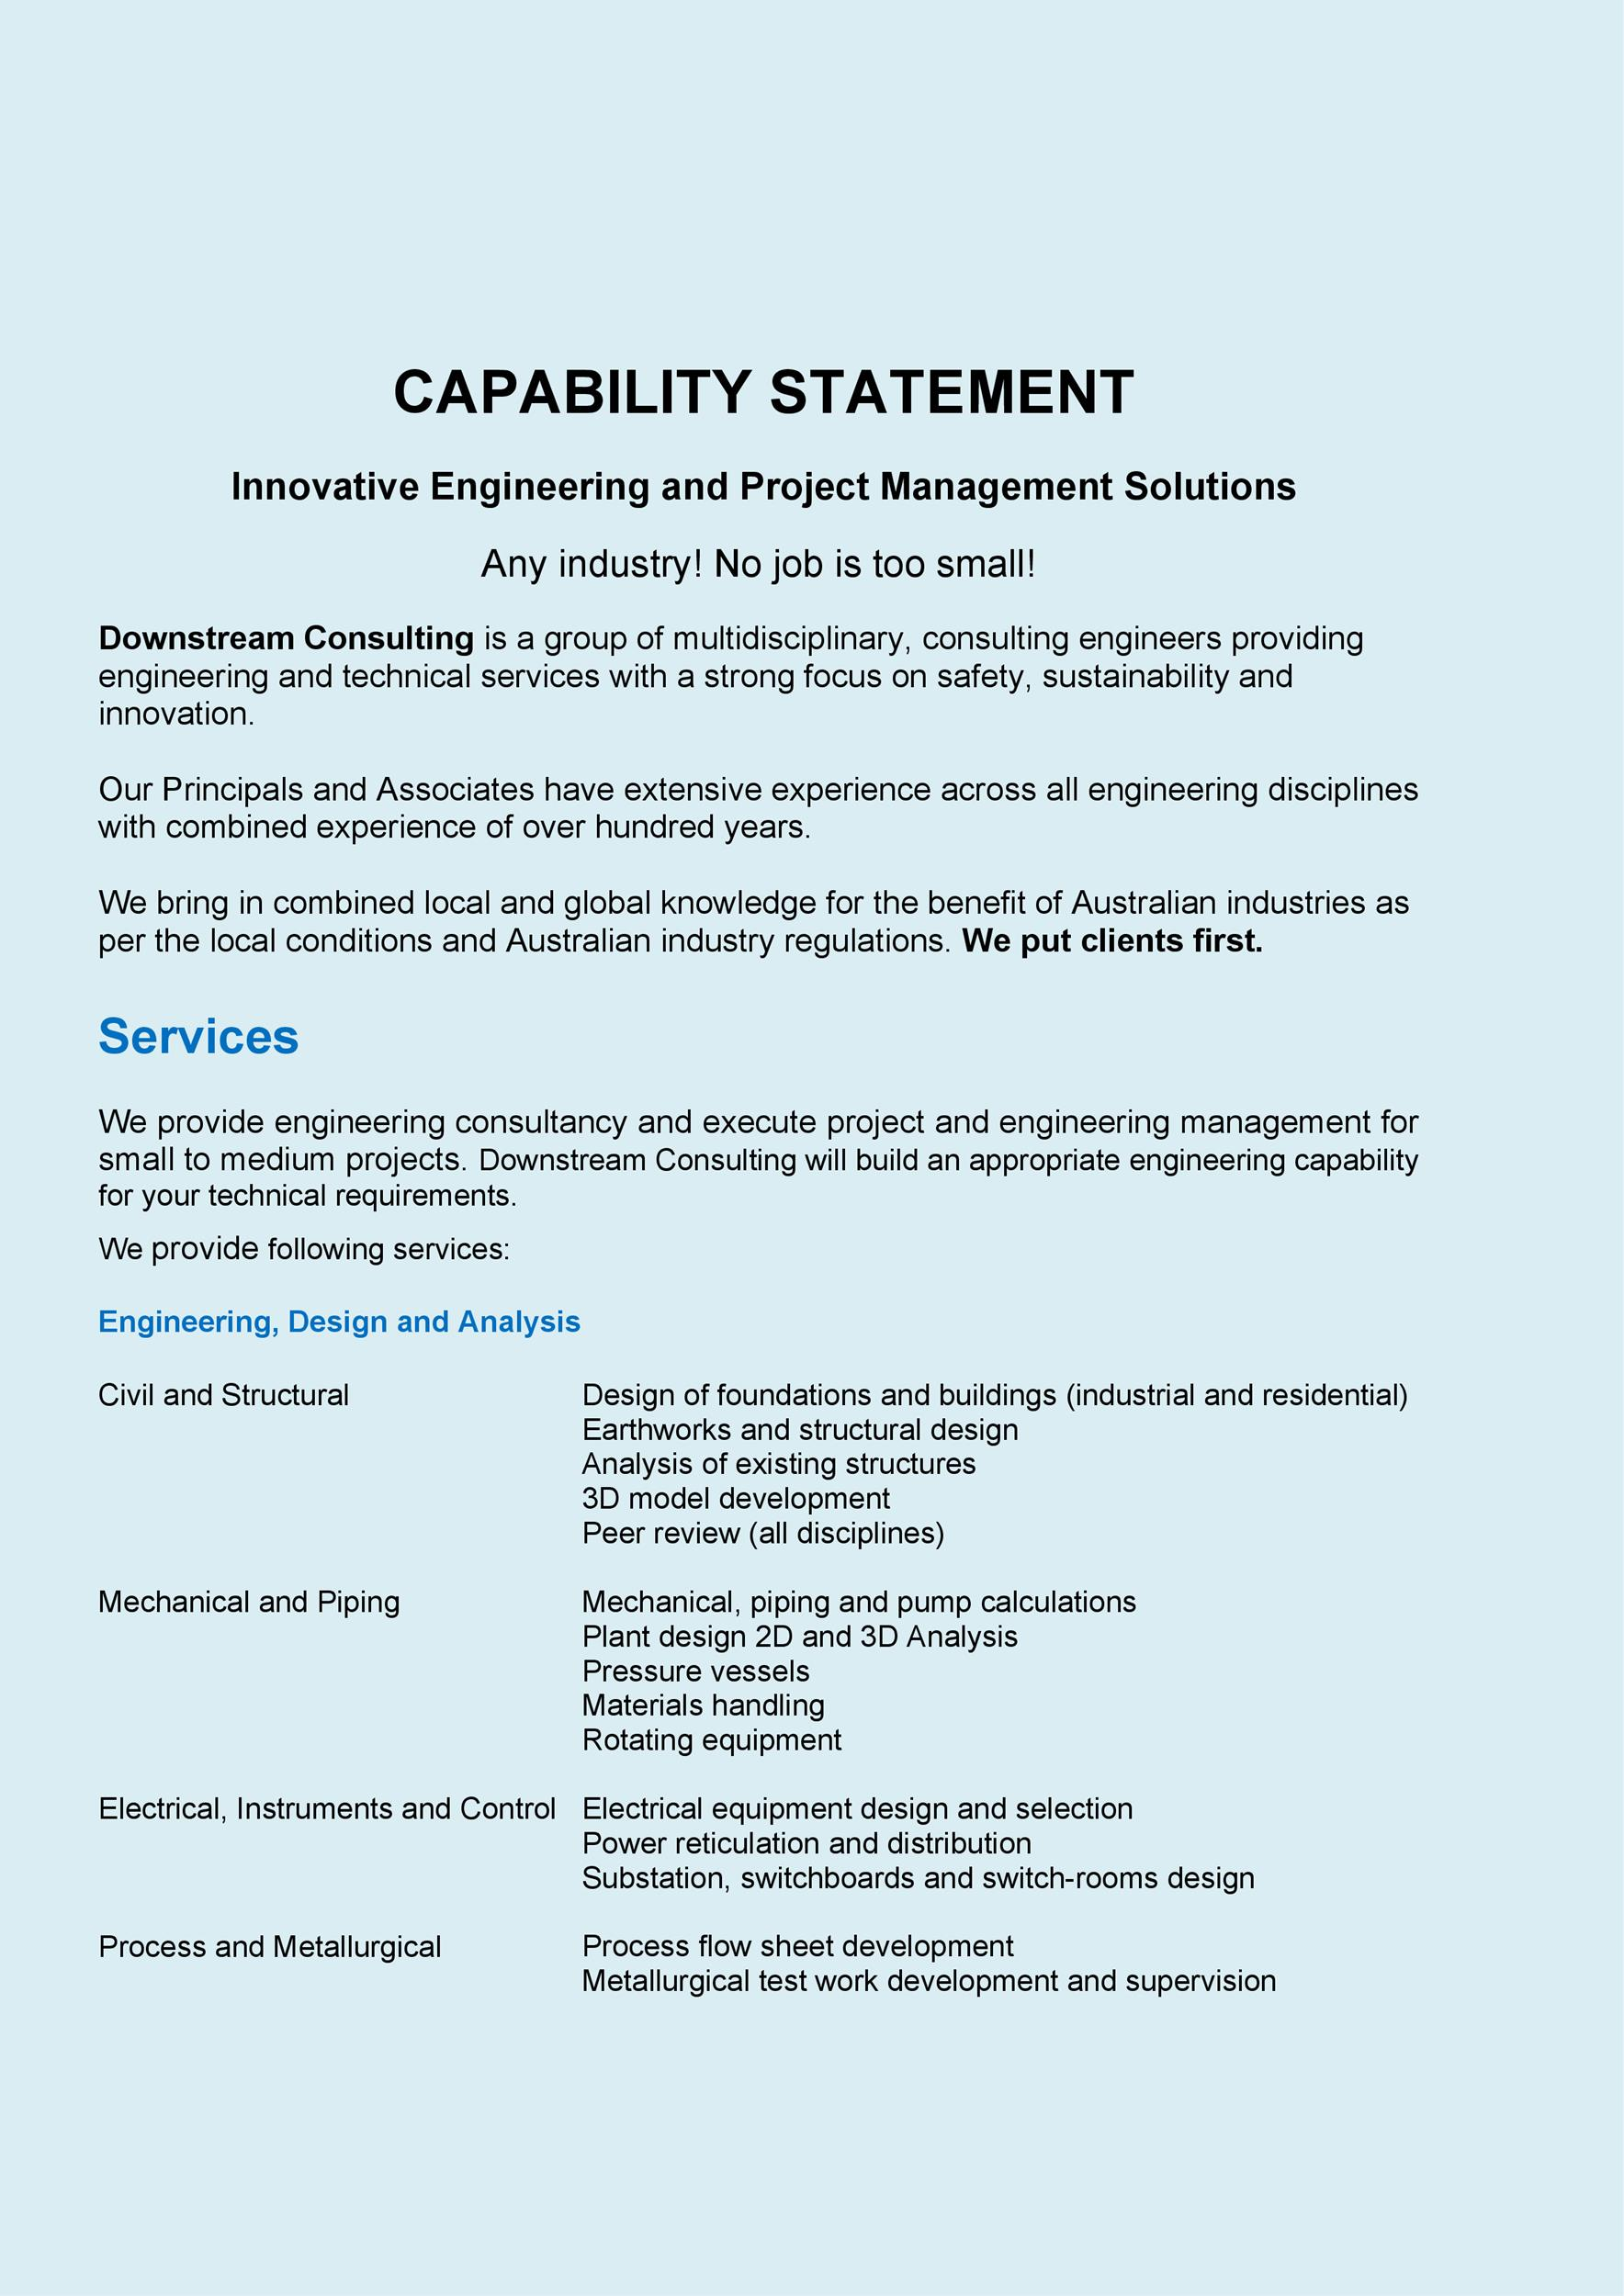 Free capability statement 20